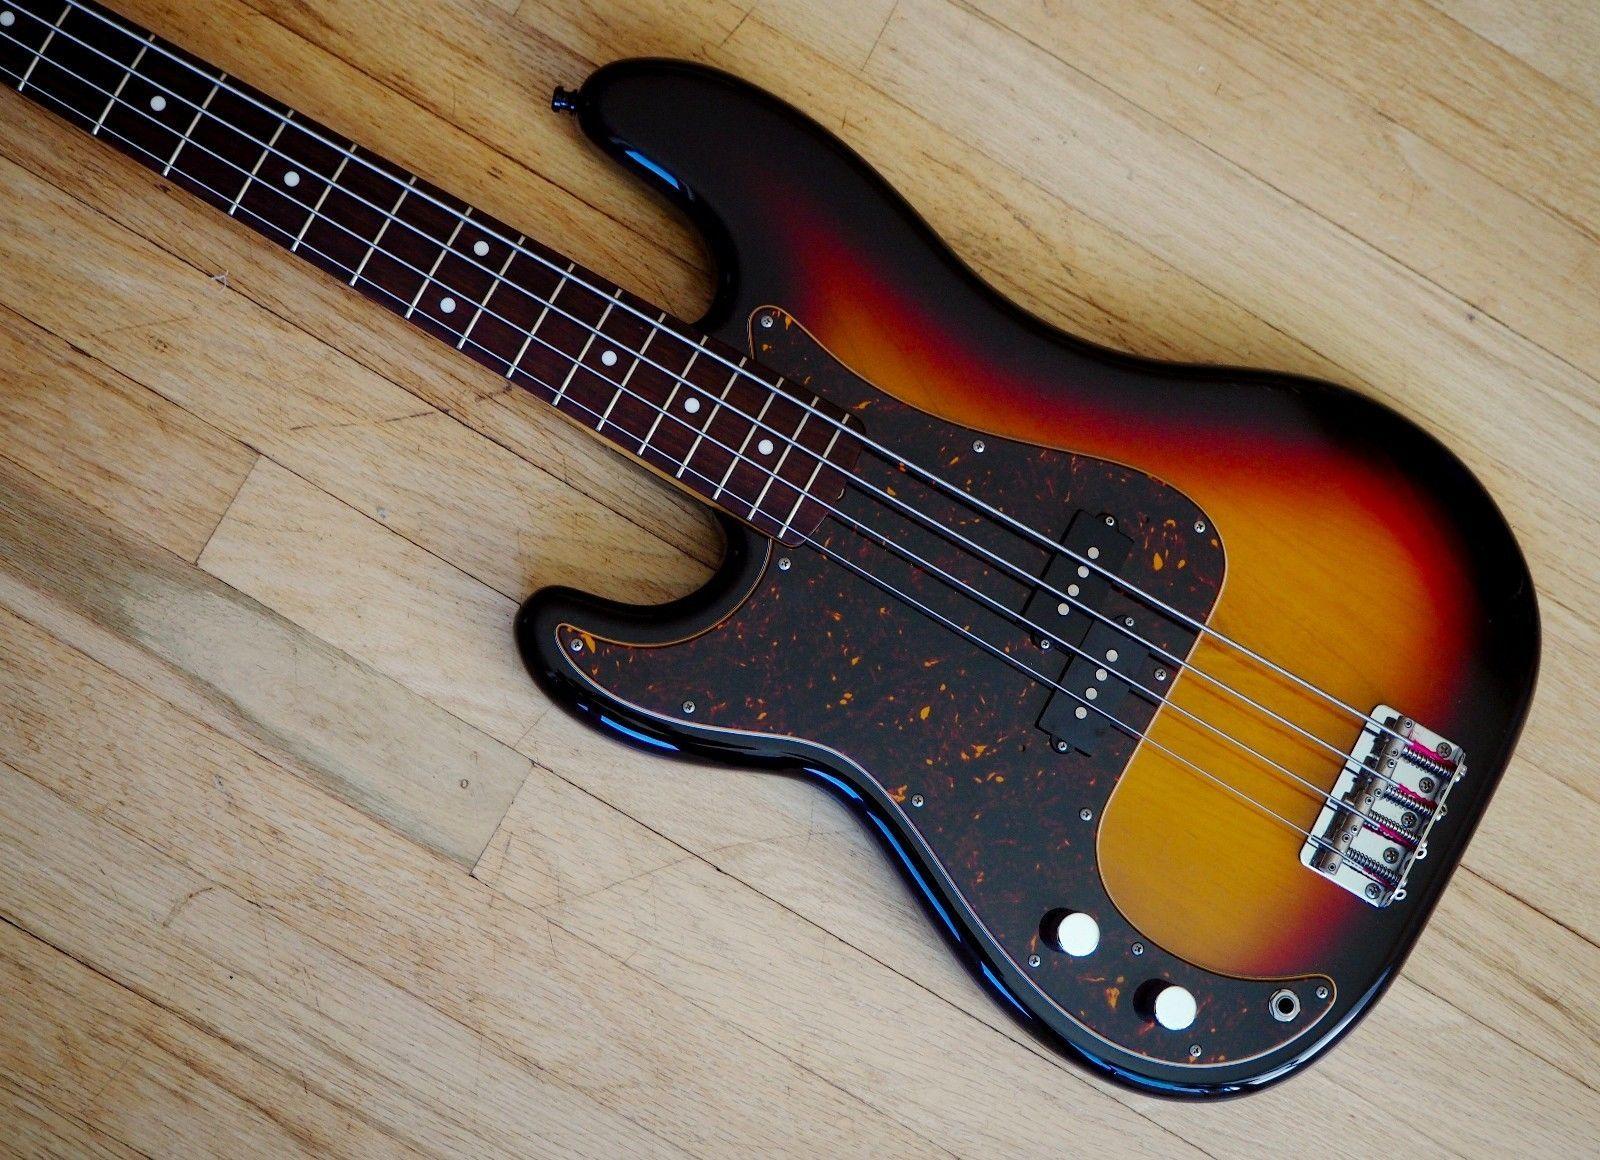 2004 Fender Precision Bass 62 Vintage Reissue Pb62 Left Handed Cij Japan Fender Precision Bass Bass Left Handed